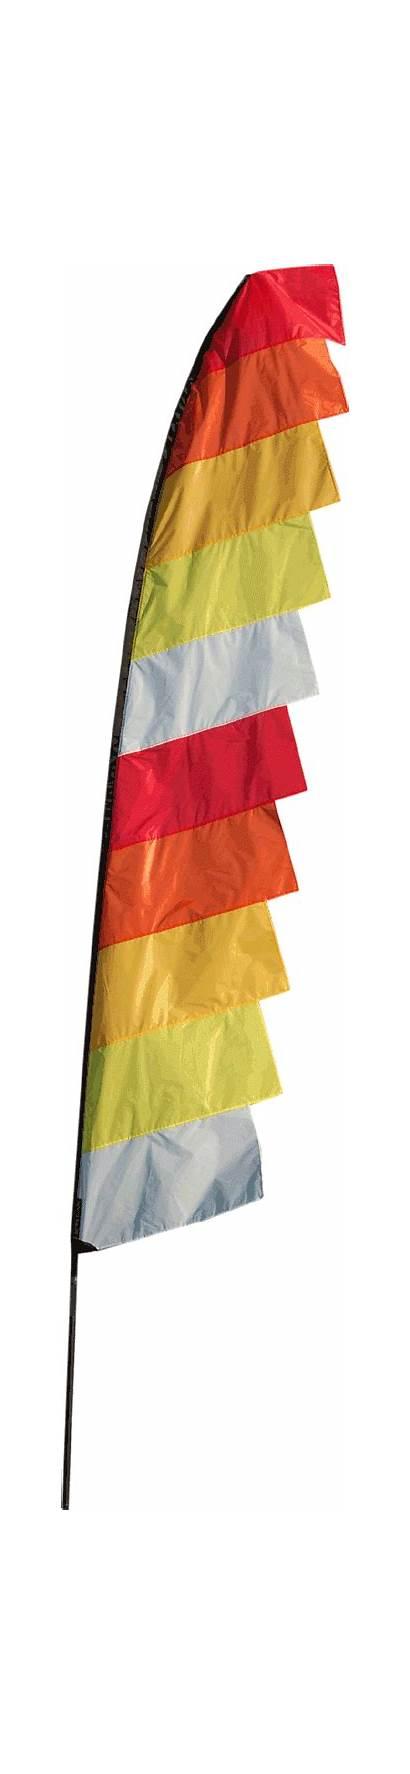 Feather Swooper 6m Banner Flagseller Flag